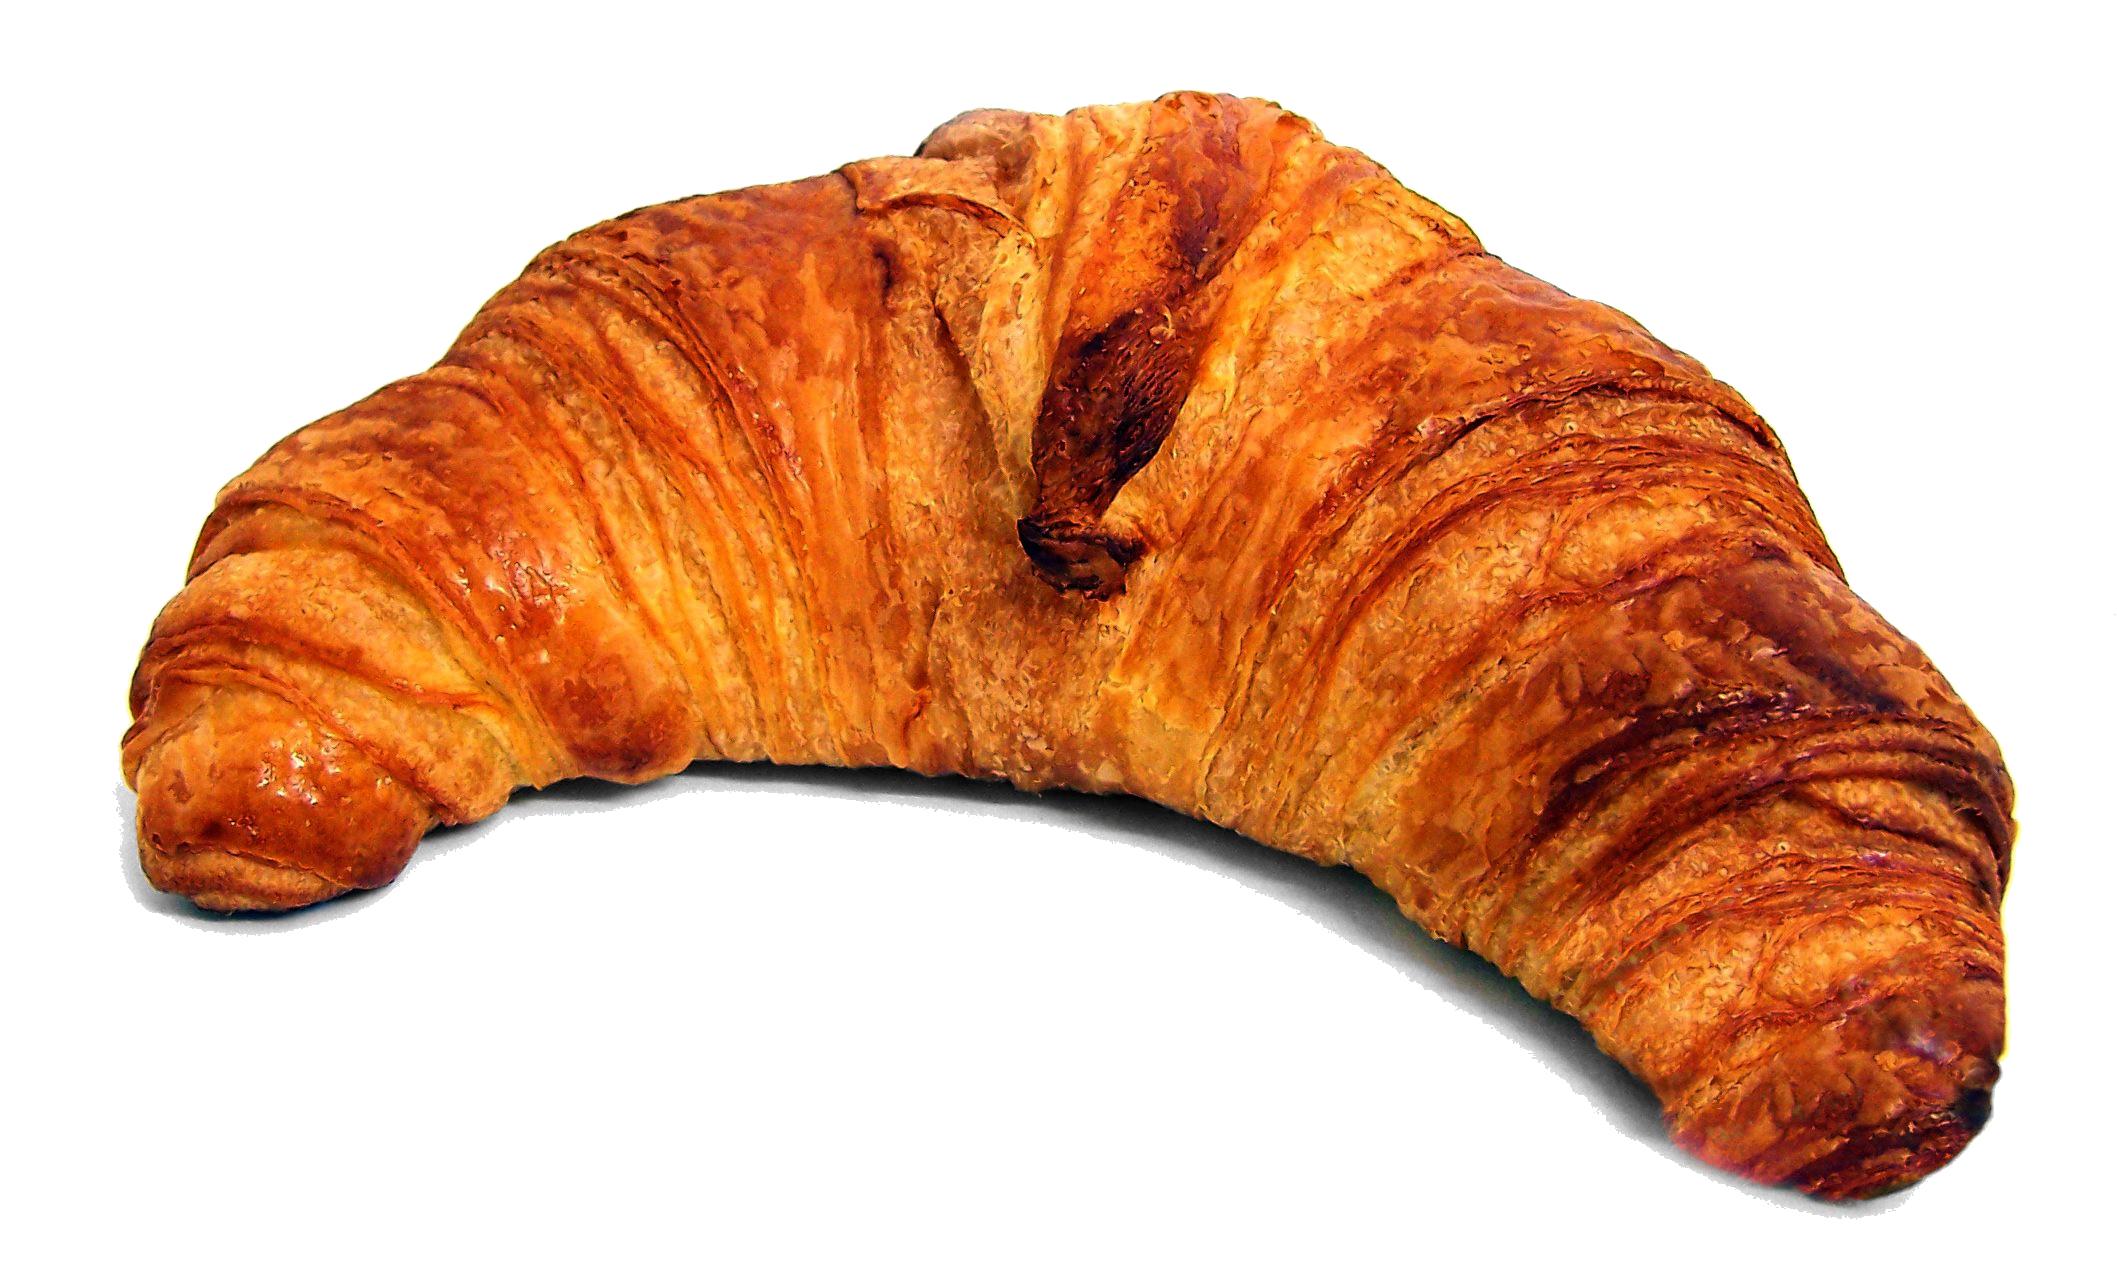 Croissant Png 1271 on Number Line Clip Art